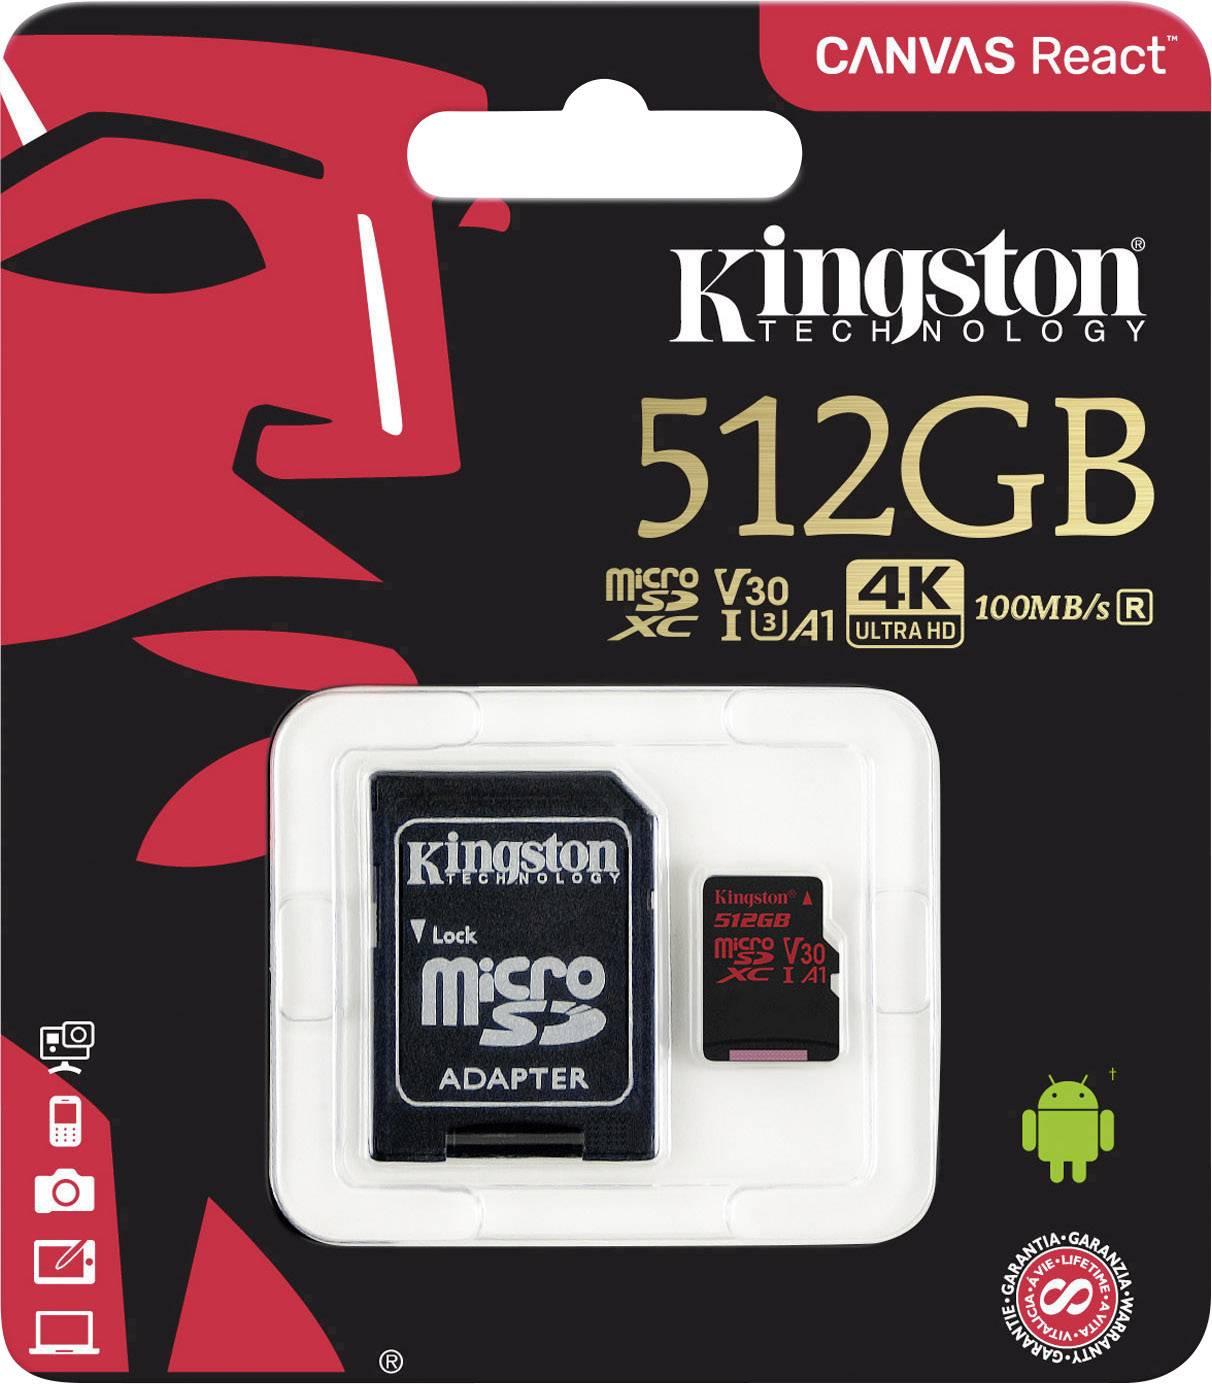 Kingston512Gb